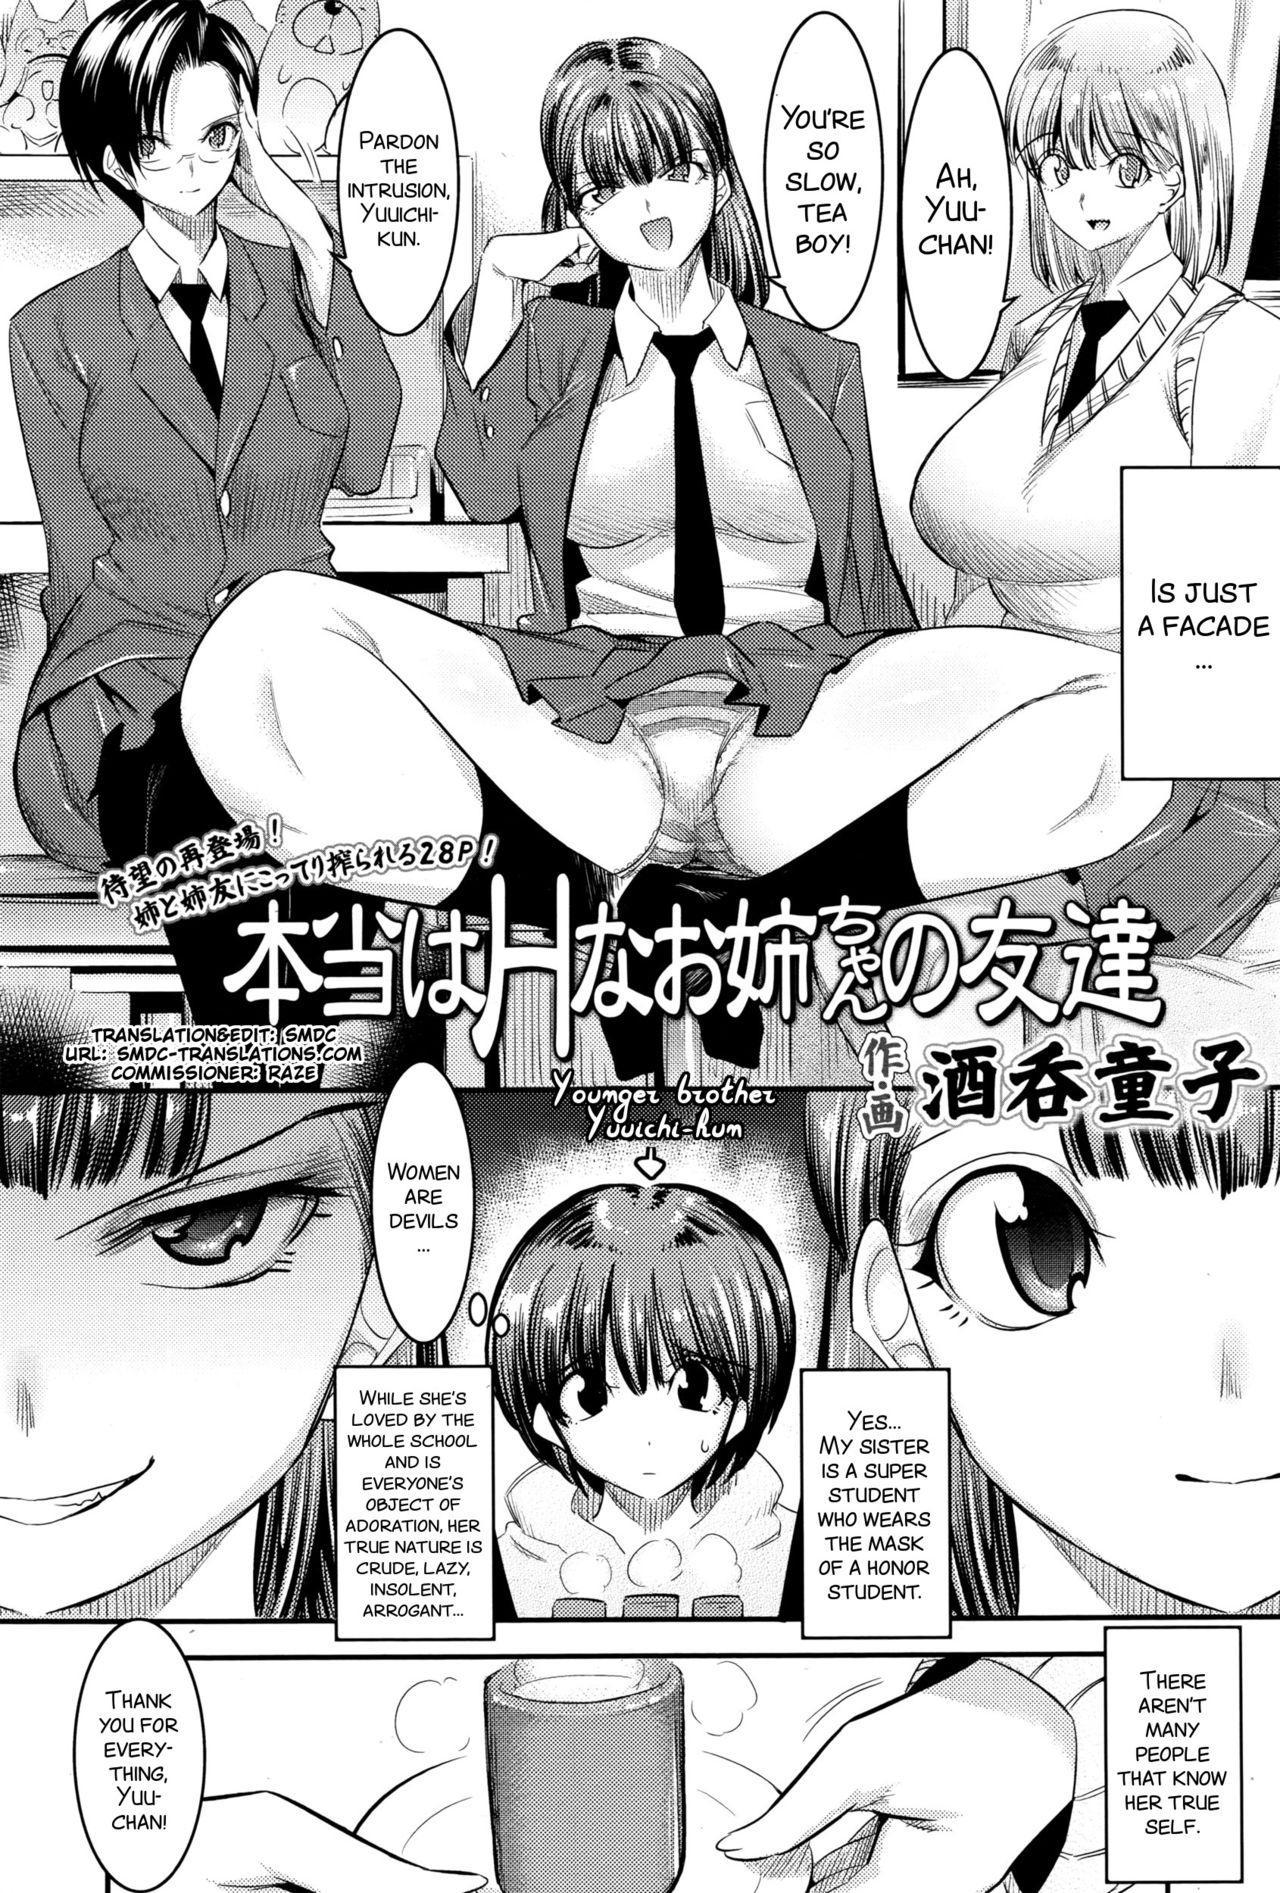 Hontou wa H na Onee-chan no Tomodachi 1